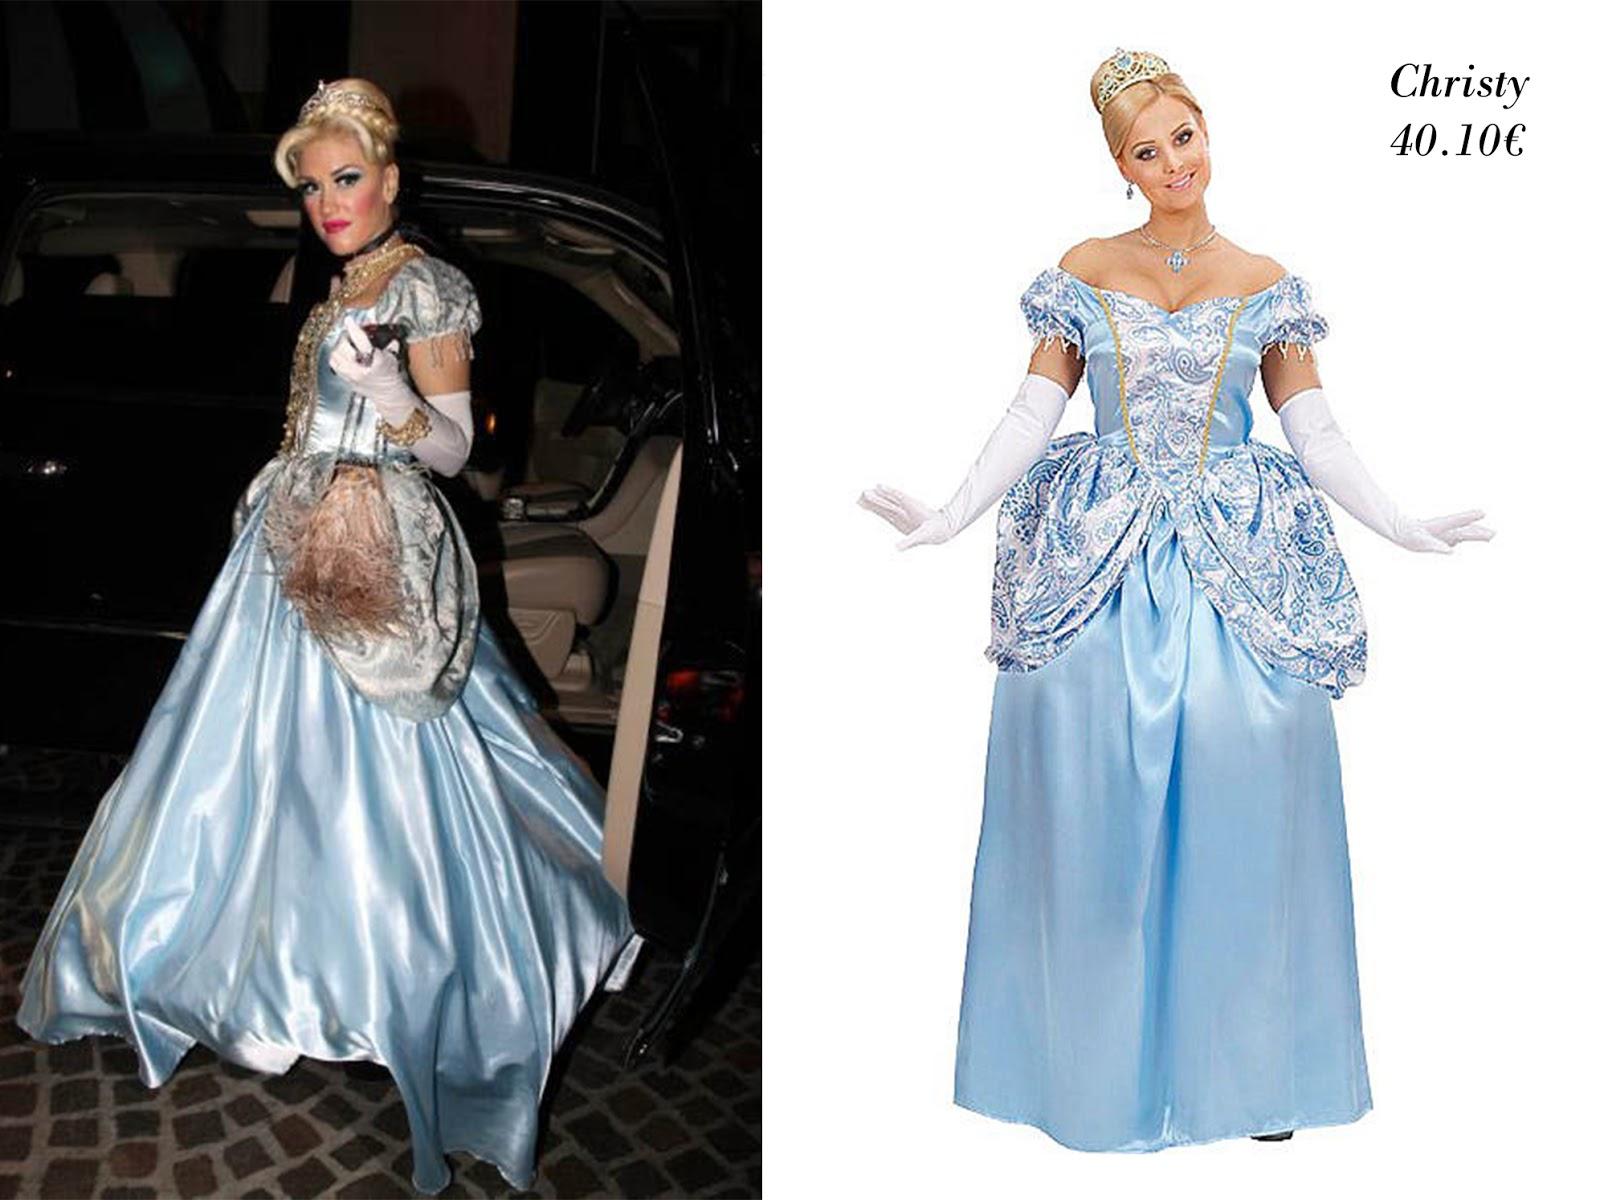 http://1.bp.blogspot.com/-60qRGdhBmQ4/UI2-VarAvrI/AAAAAAAADMQ/_yAKlgssEF4/s1600/Gwen+Stefani+disfraz+princesa.jpg